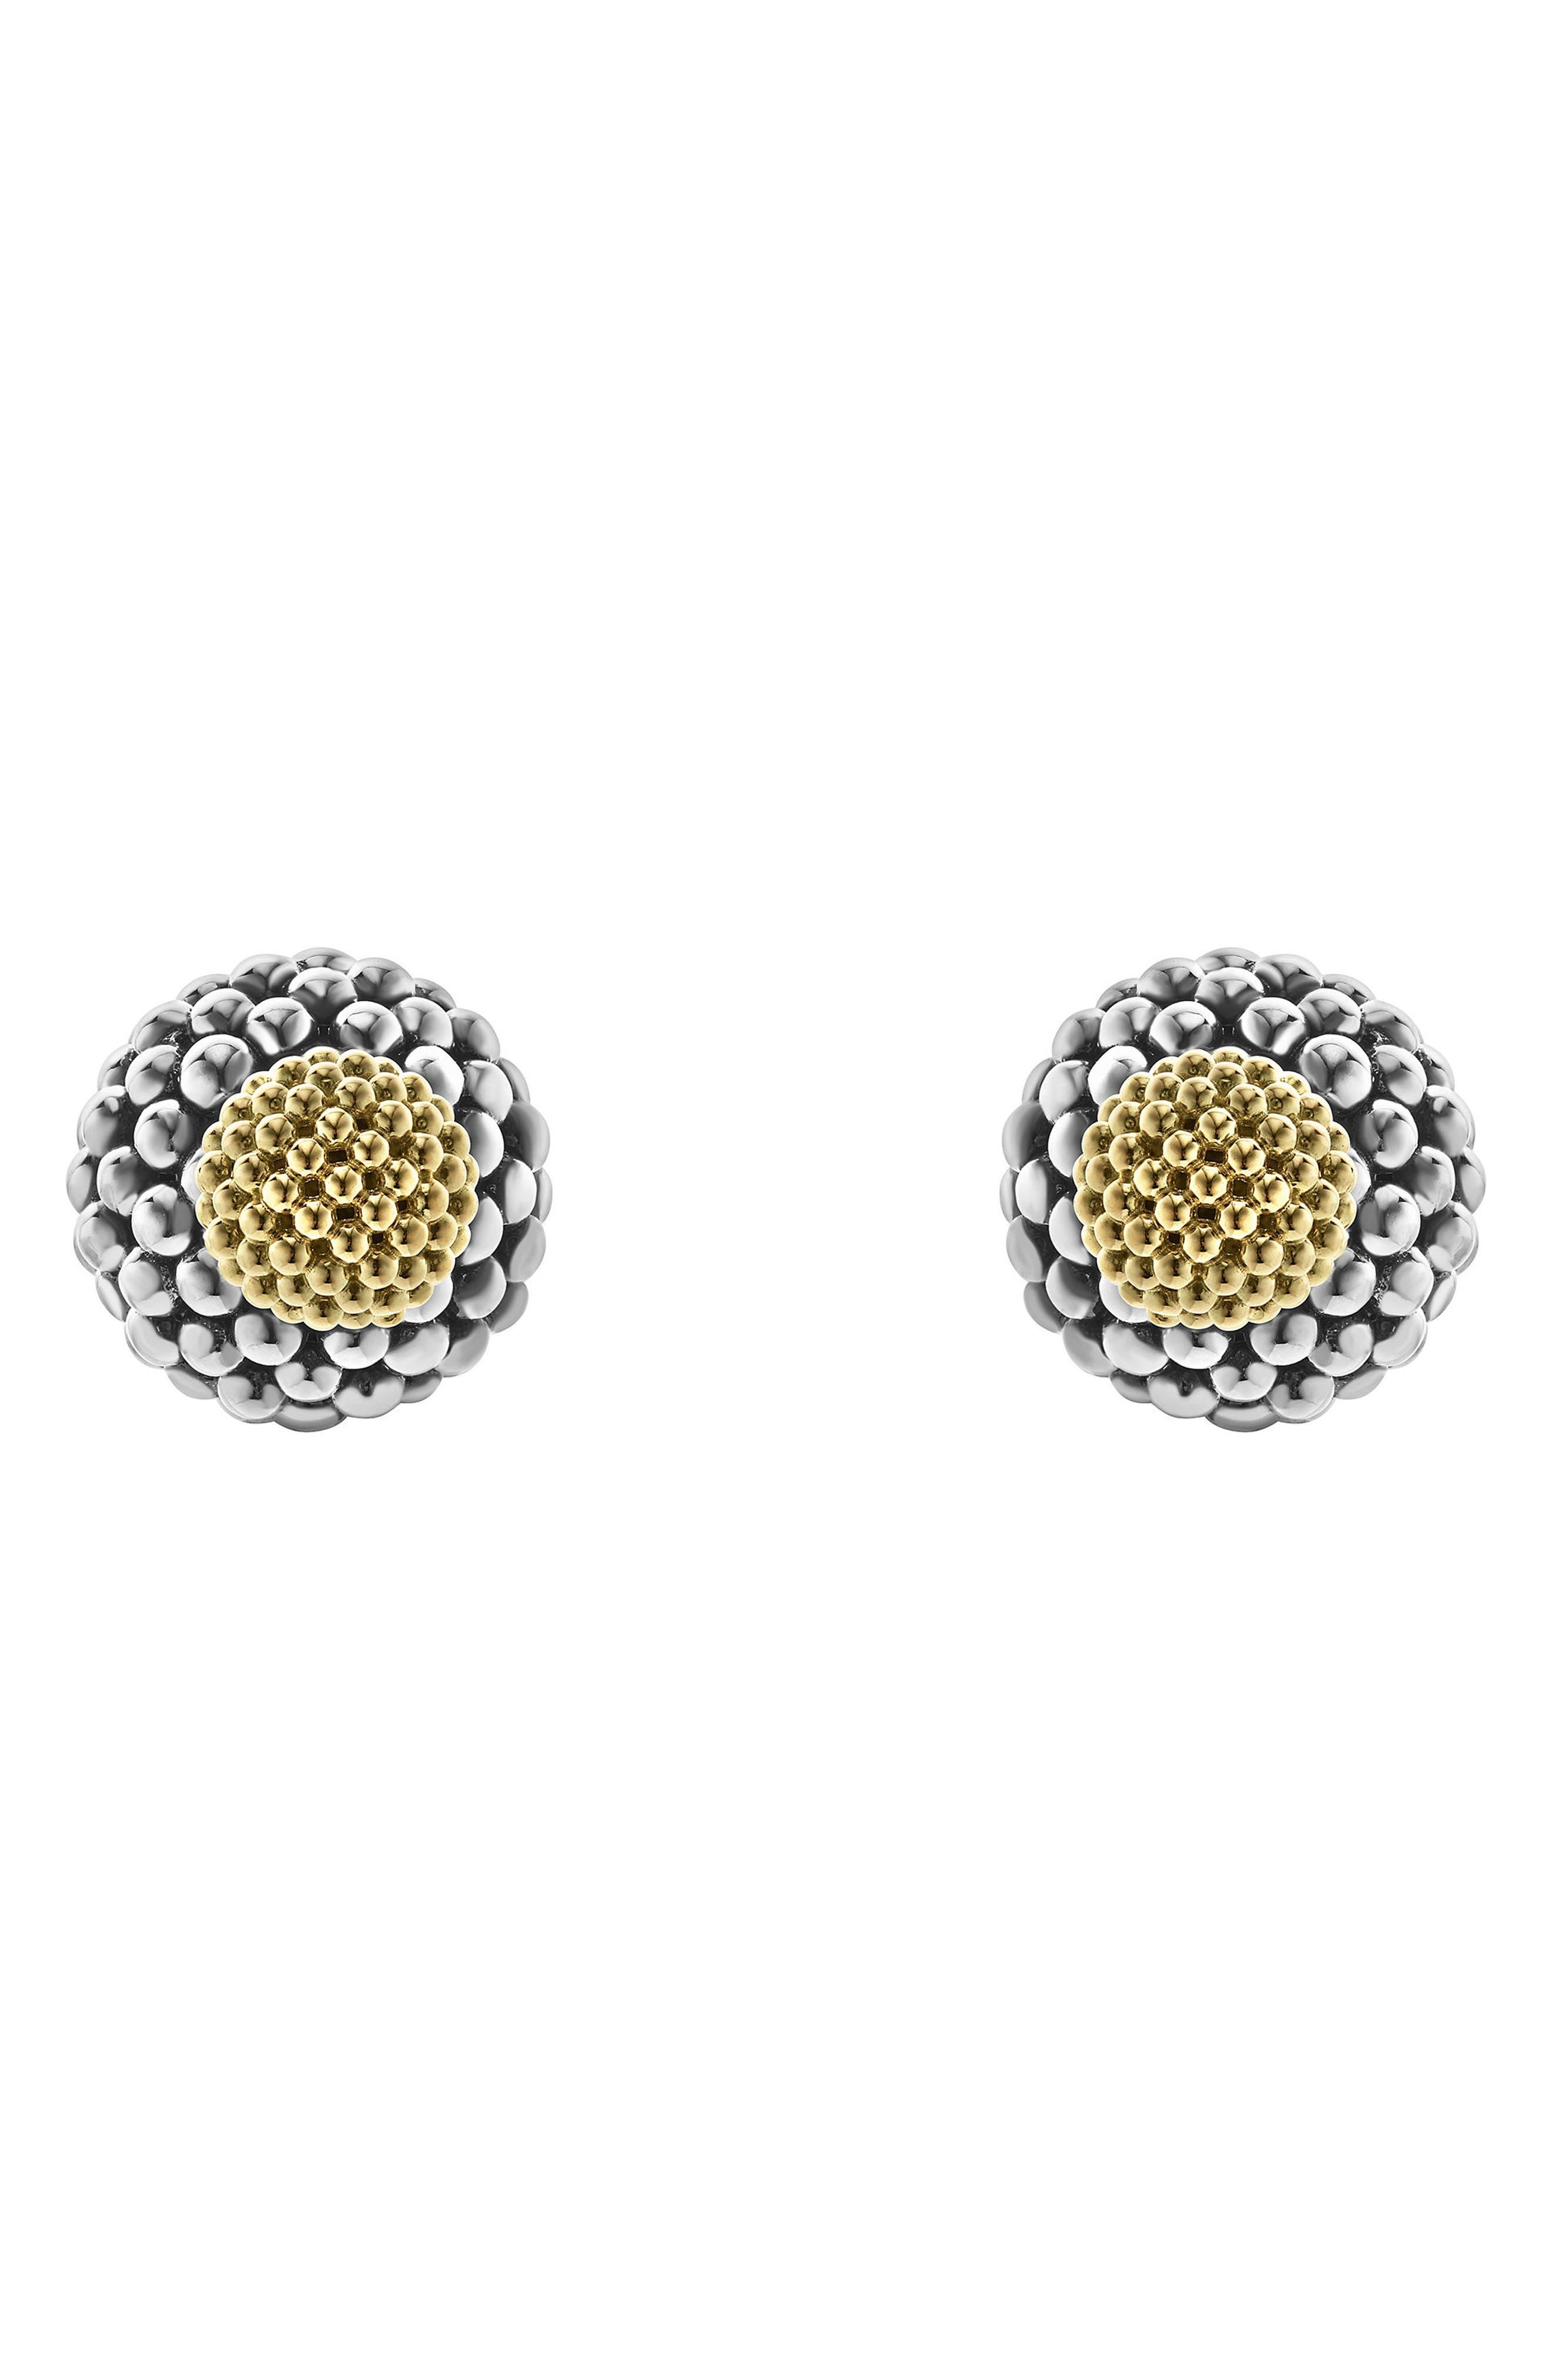 Alternate Image 1 Selected - LAGOS Caviar Ball Stud Earrings